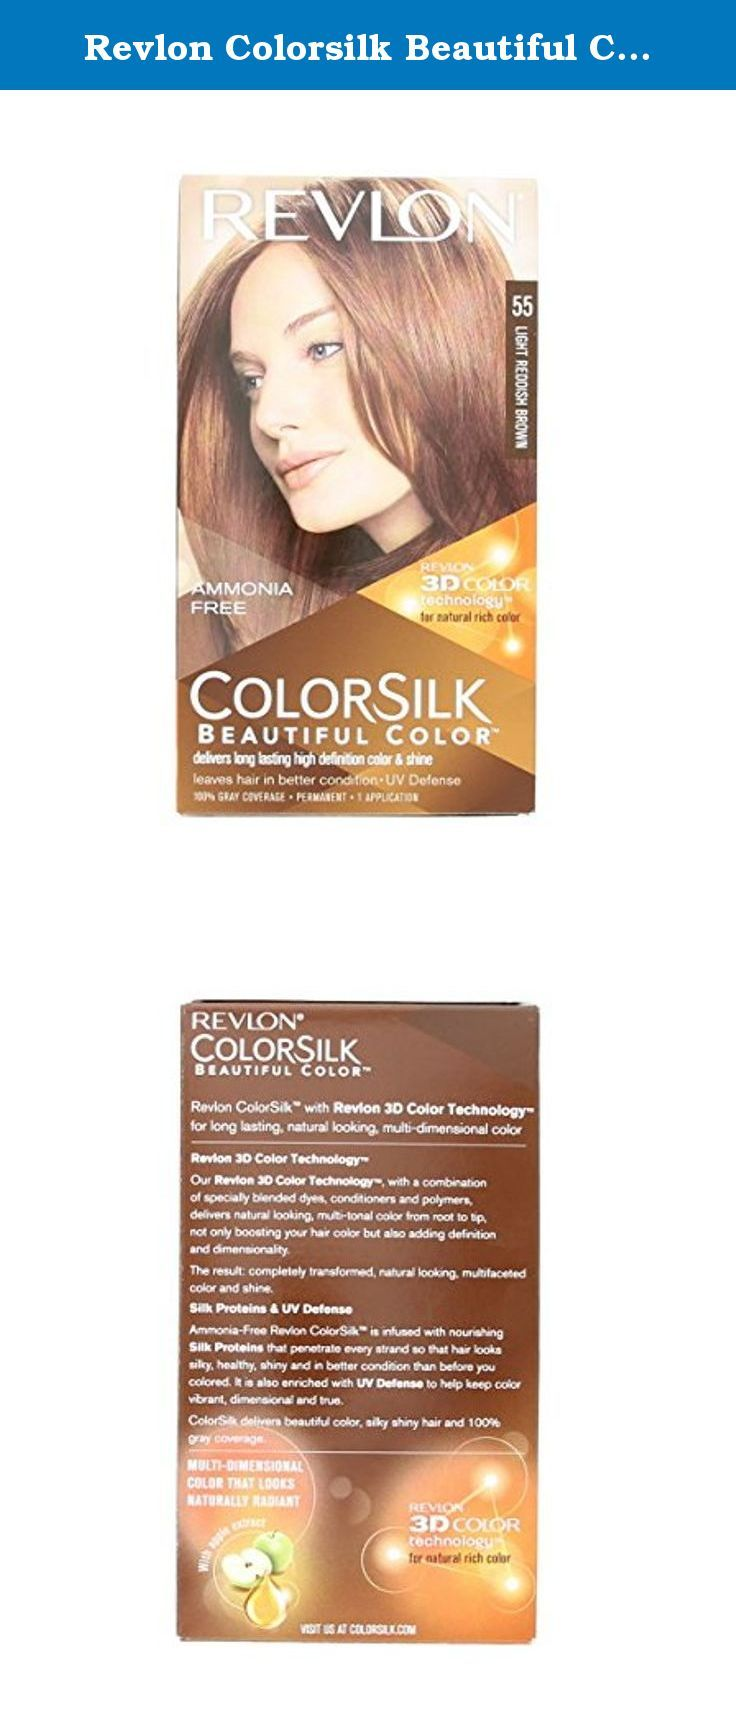 Colorsilk beautiful color 55 light reddish brown by revlon hair color - Revlon Colorsilk Beautiful Color Light Reddish Brown 55 Color Silk Beautiful Color Light